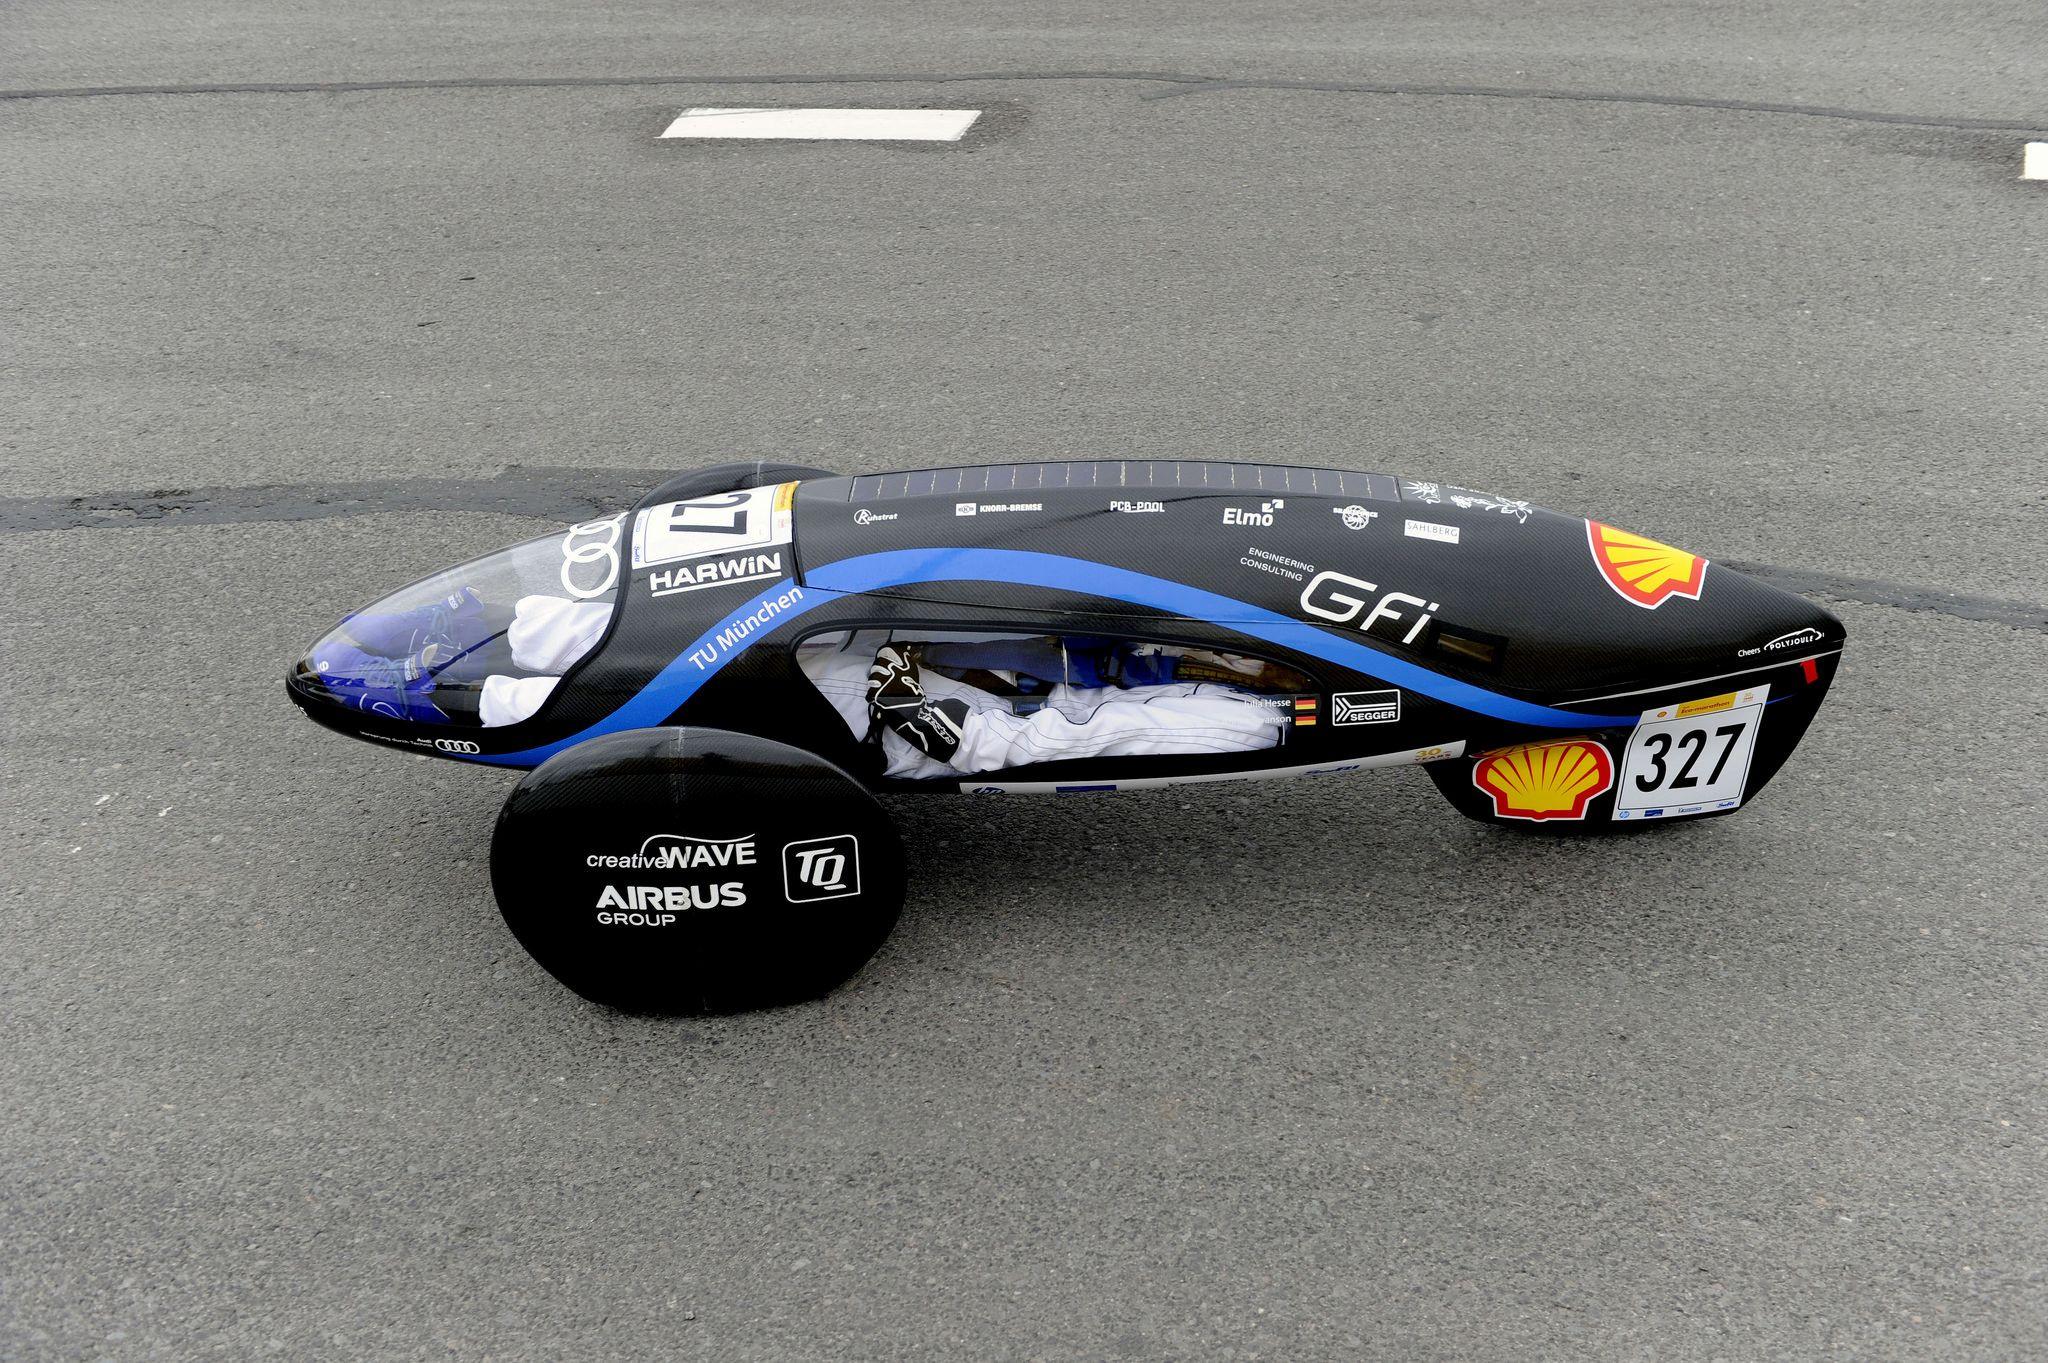 Shell eco marathon europe 2015 competition day 2 the eli15 327